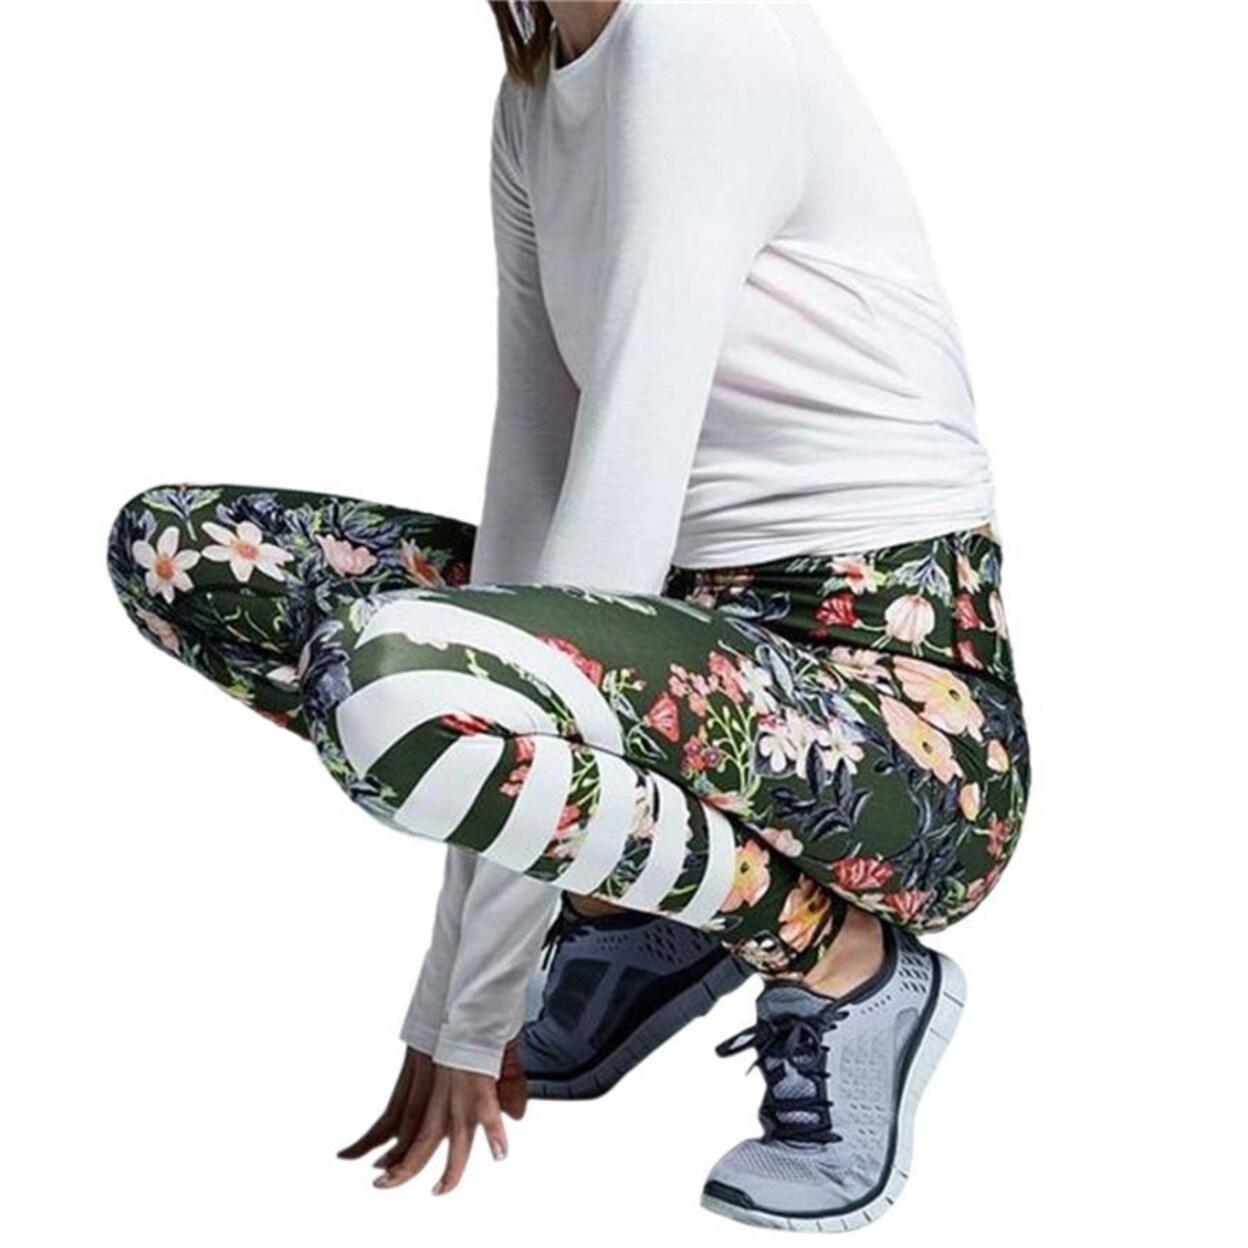 Womens FloralPrinted YogaPants Workout Gym Leggings Fitness Sports Striped Pants